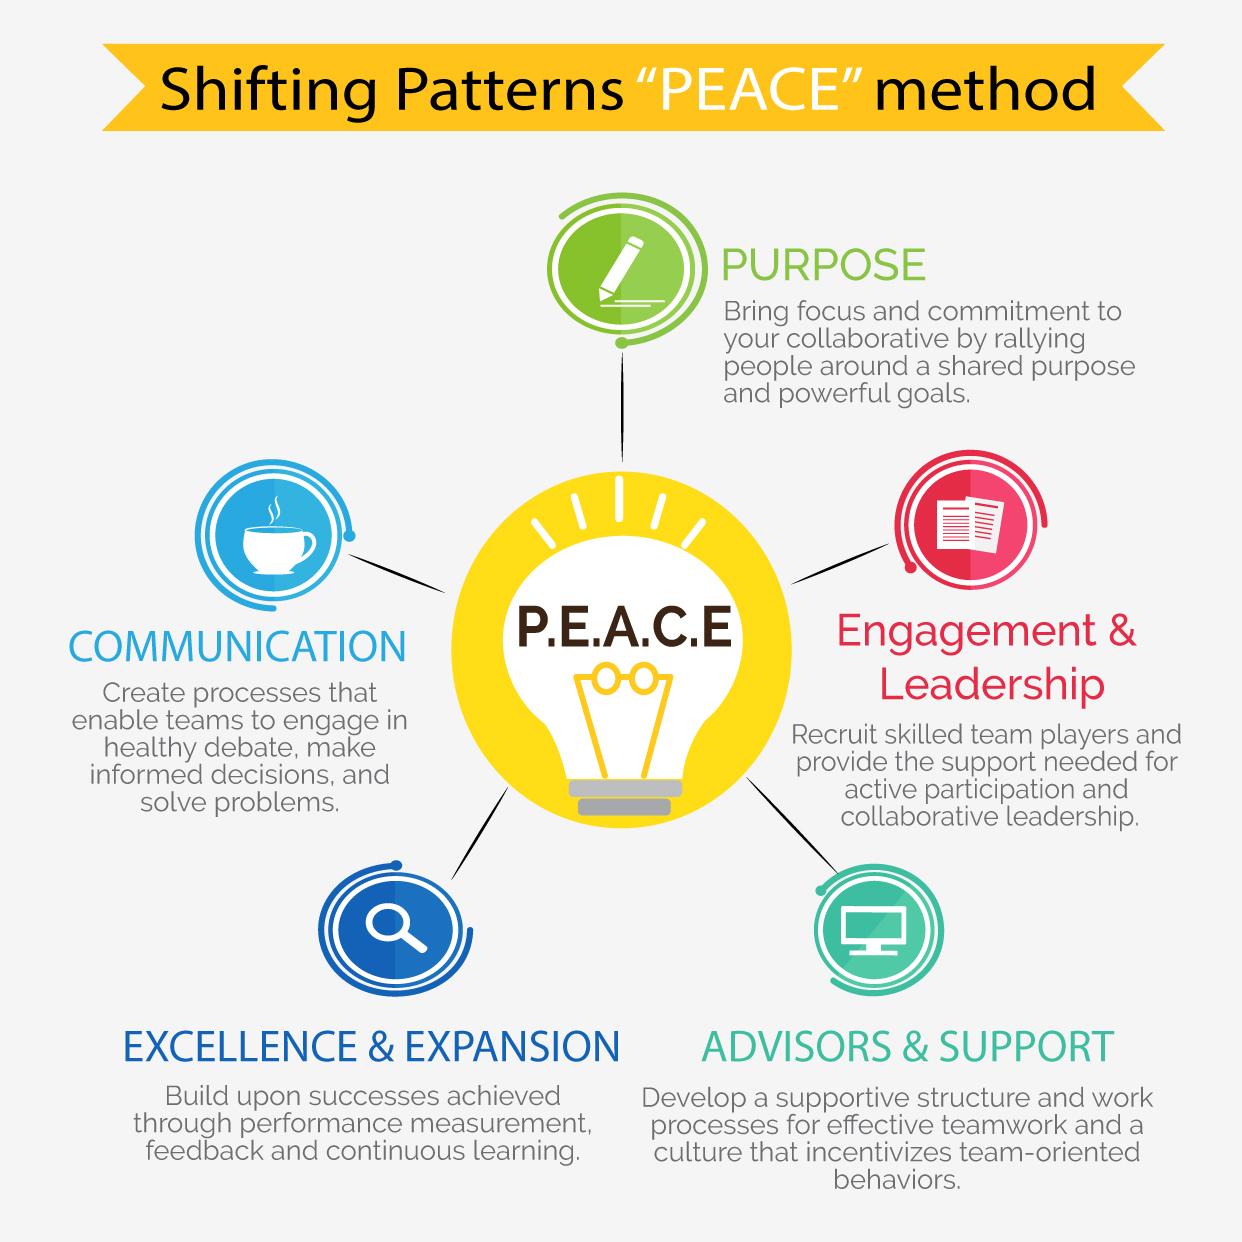 SP-Peace-Method.jpg